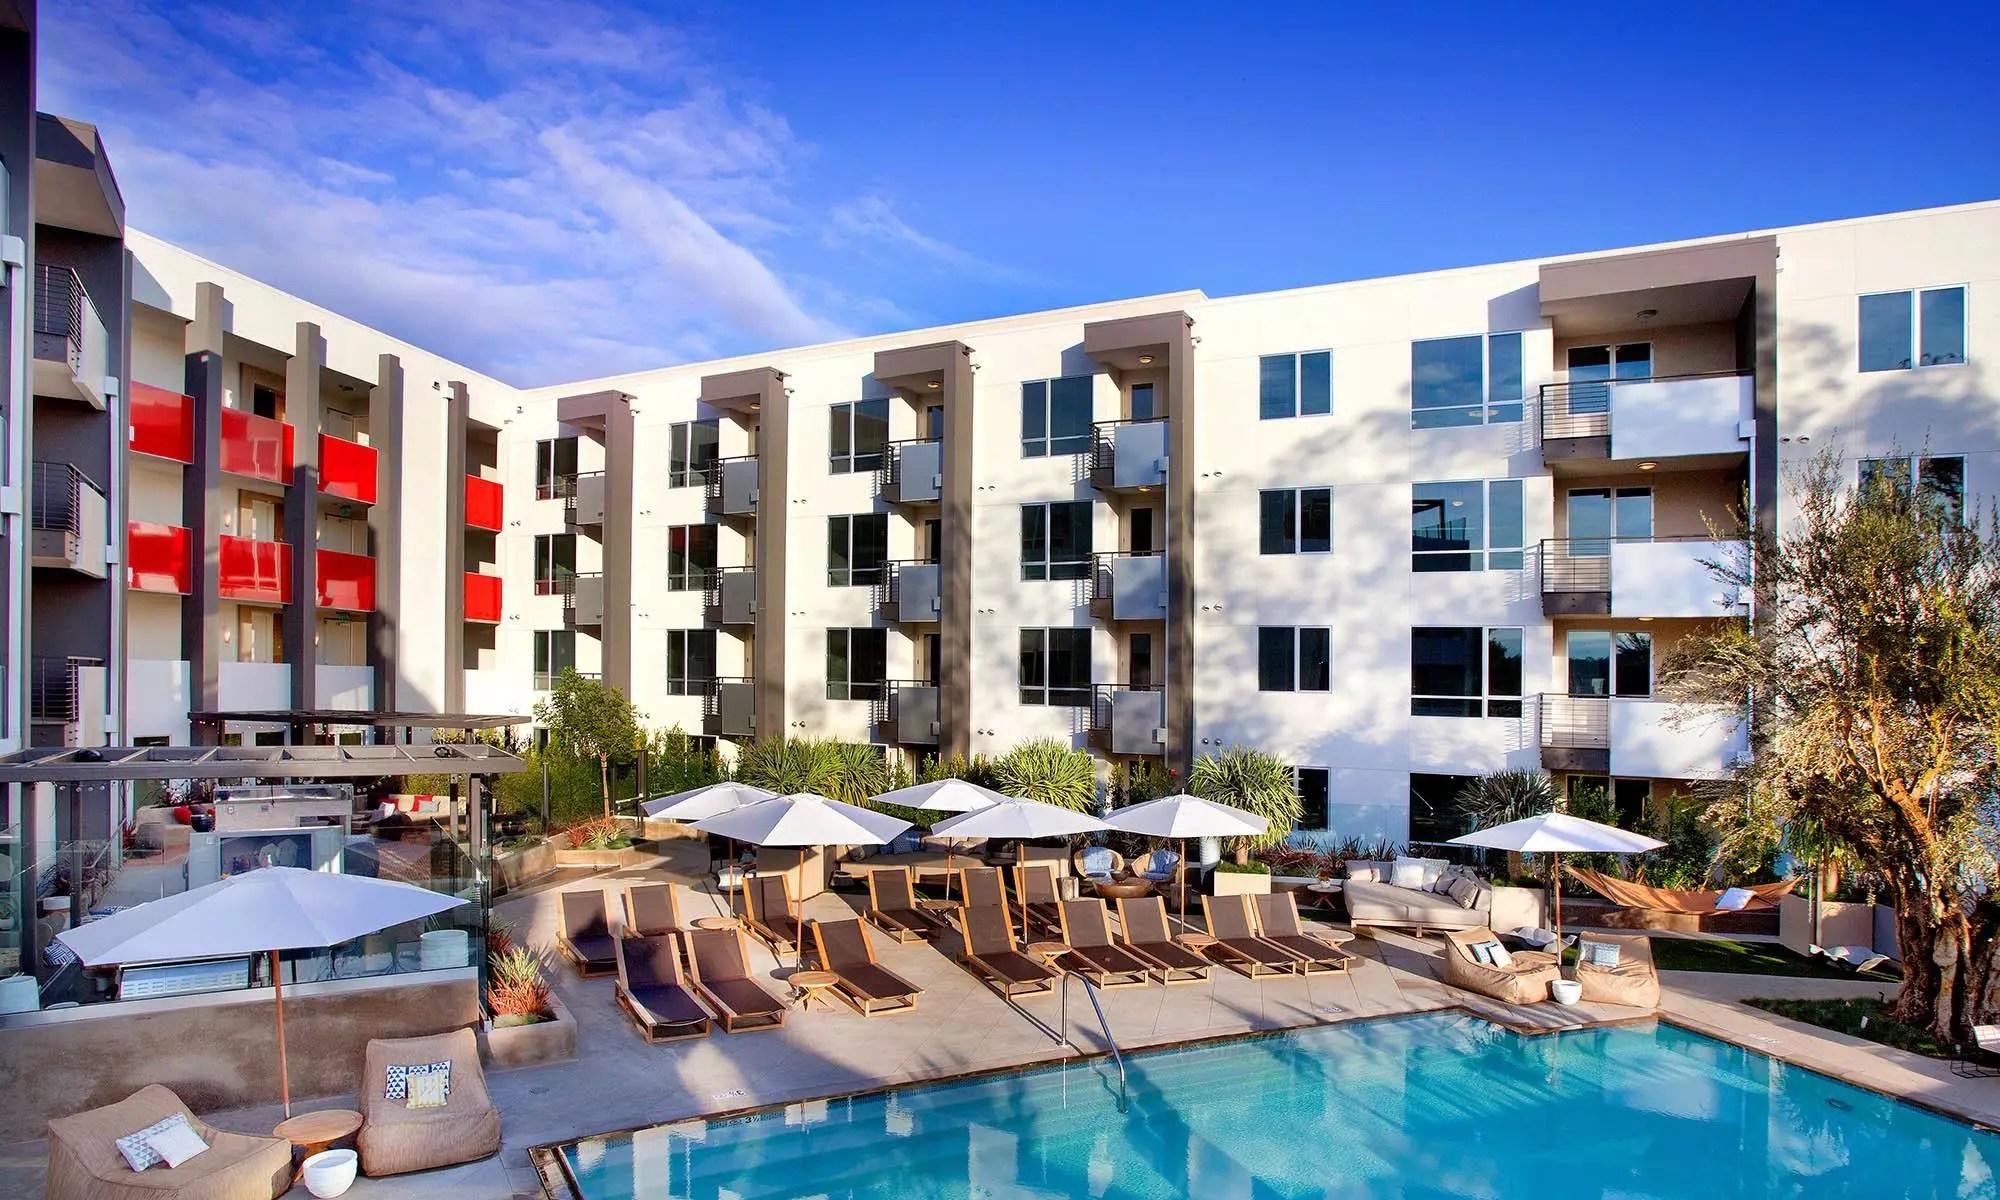 West Glendale, CA Modern Apartments